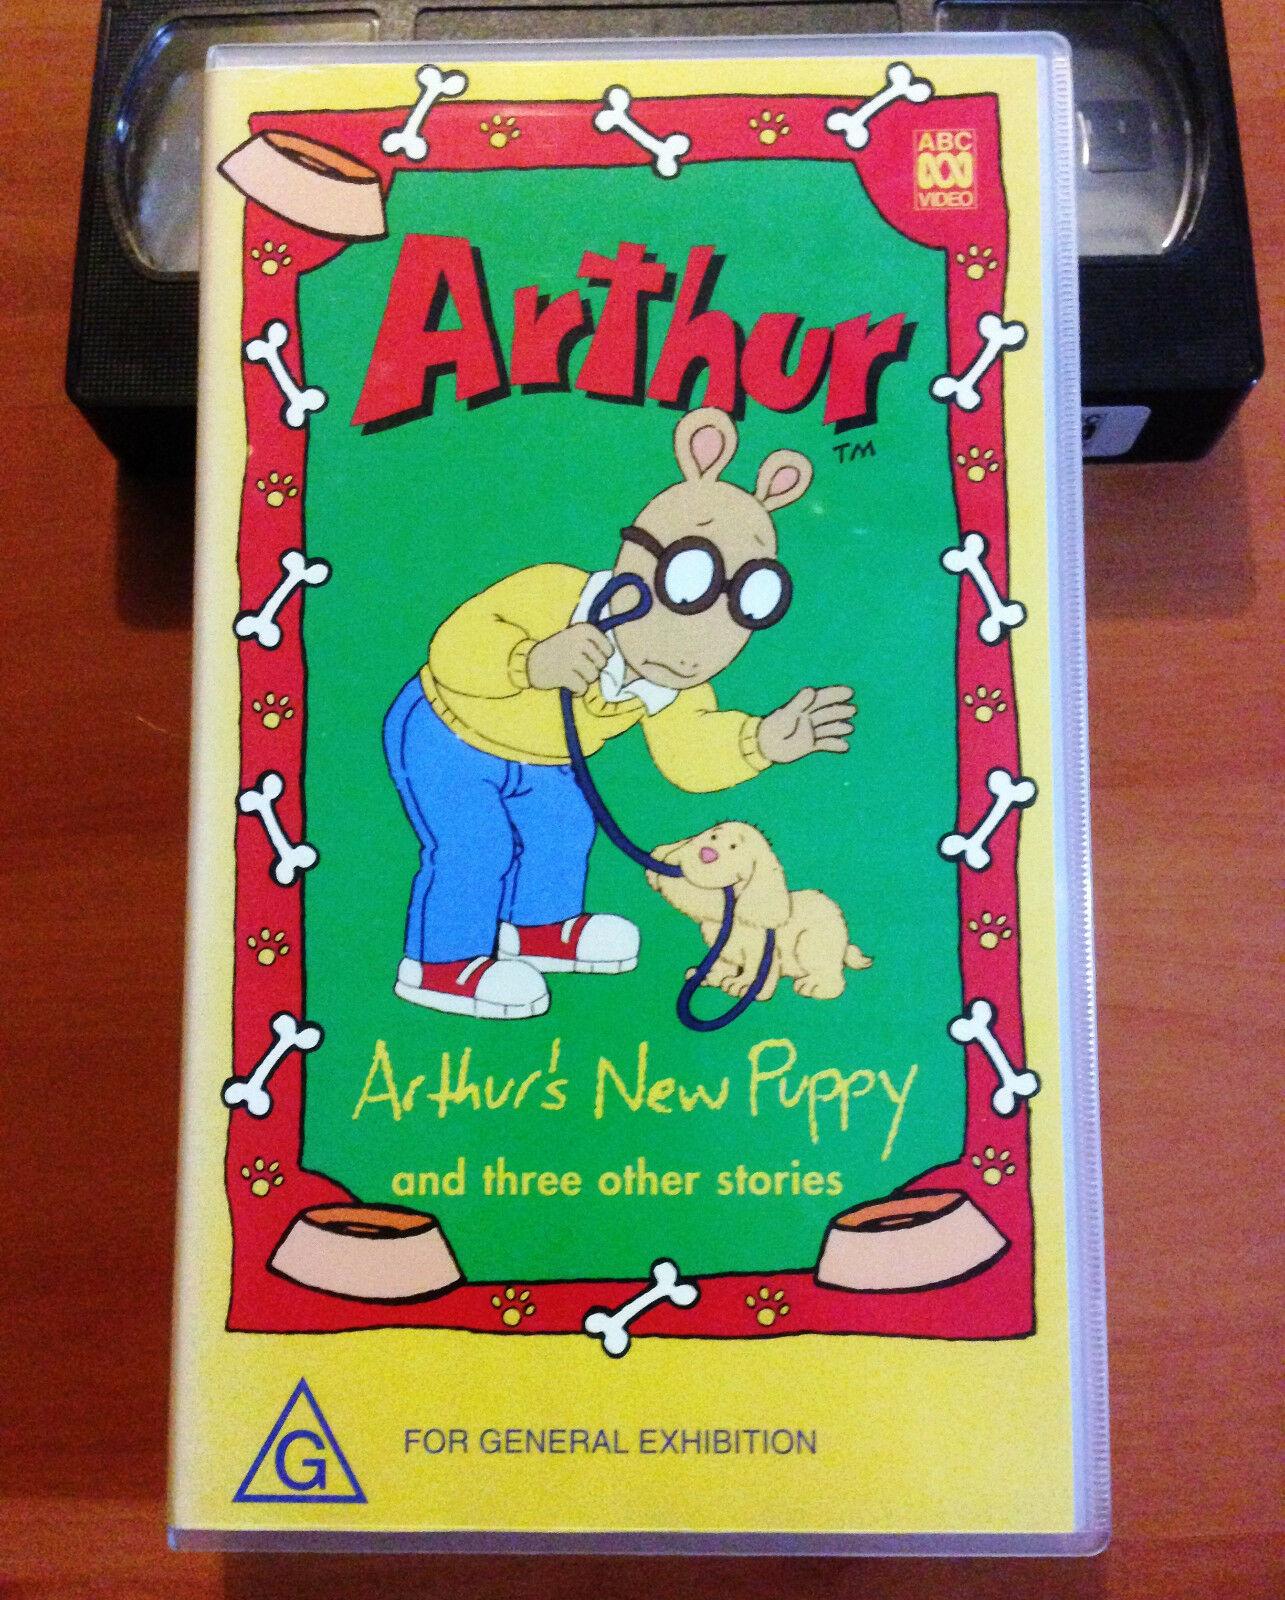 Arthur's New Puppy (video)